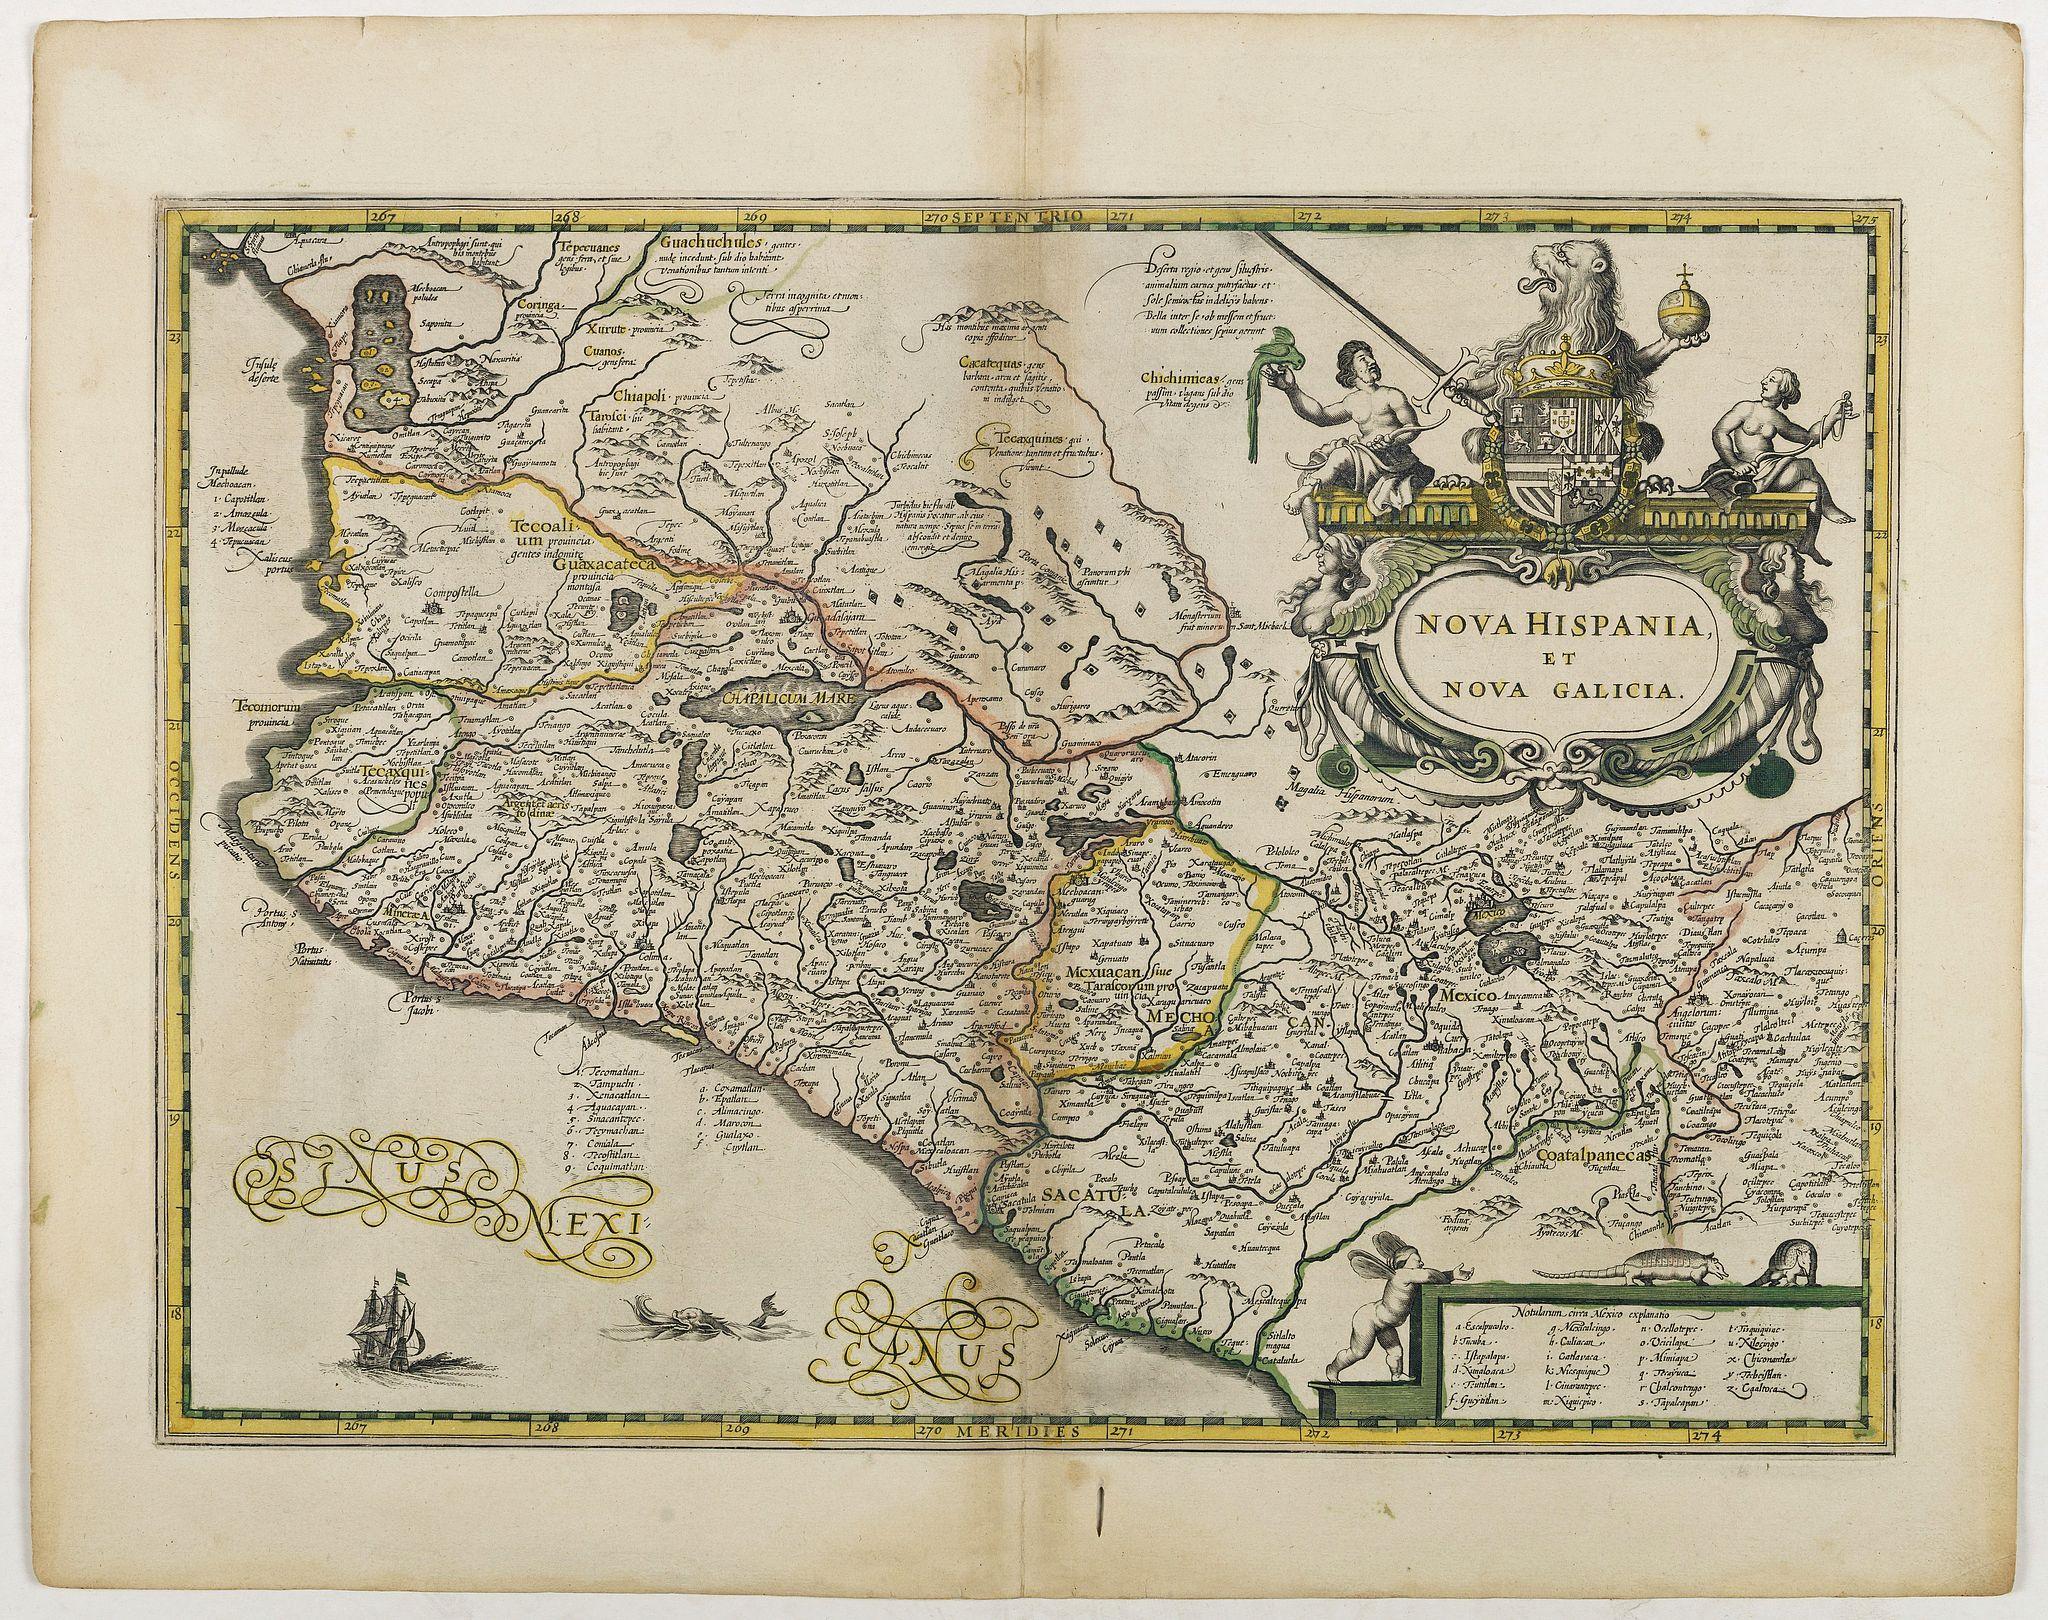 JANSSONIUS, J. -  Nova Hispania et Nova Galicia.